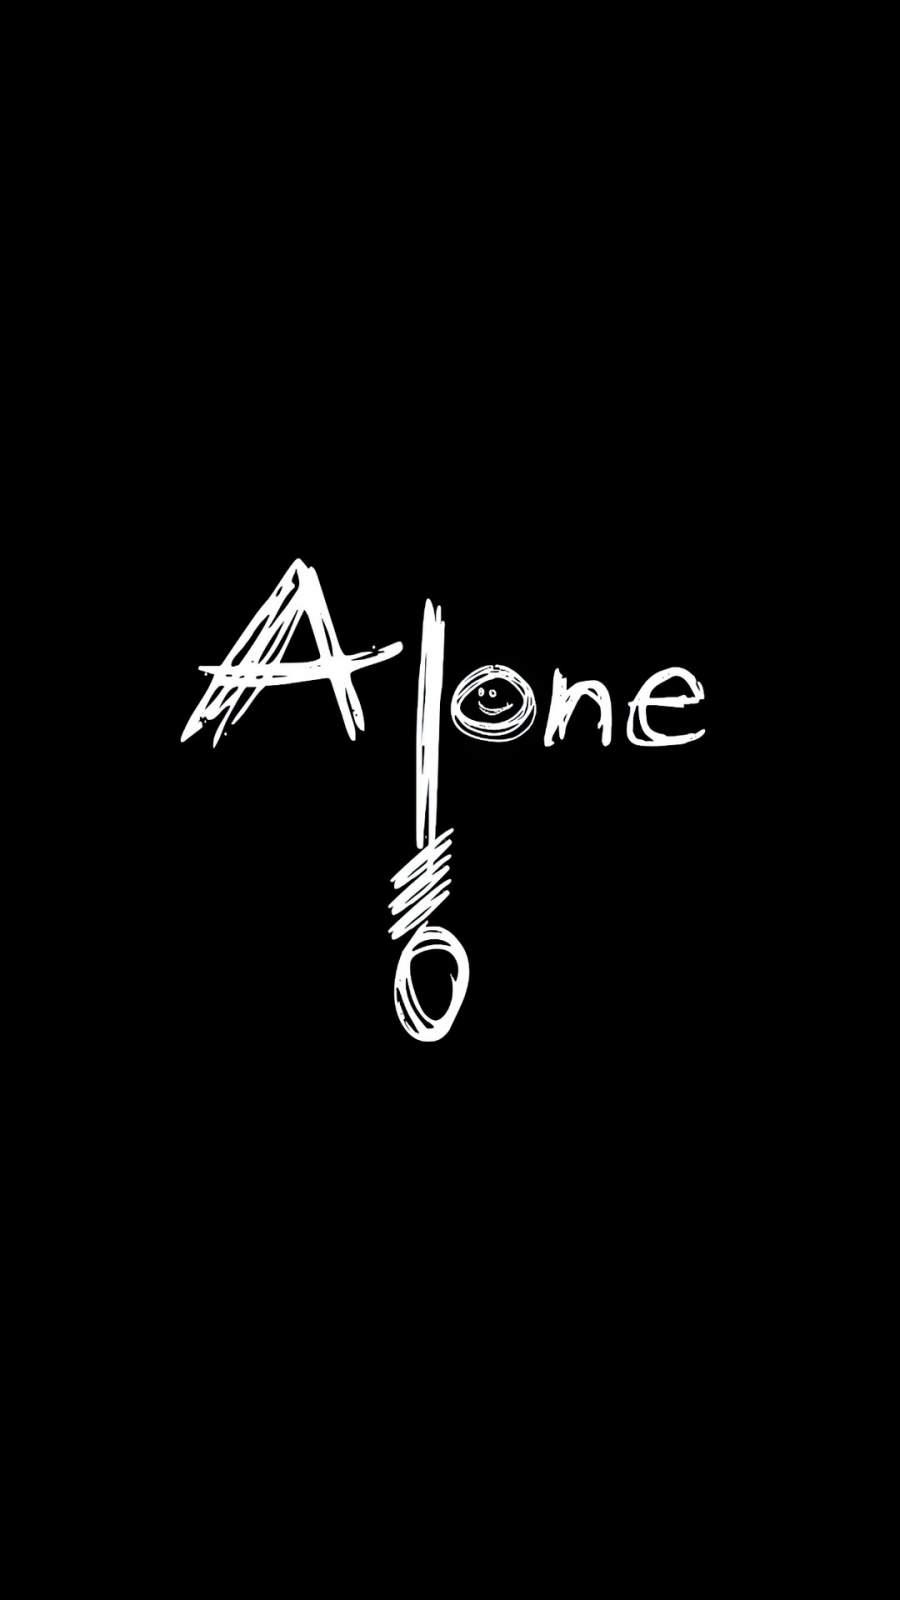 Alone Dark iPhone Wallpaper